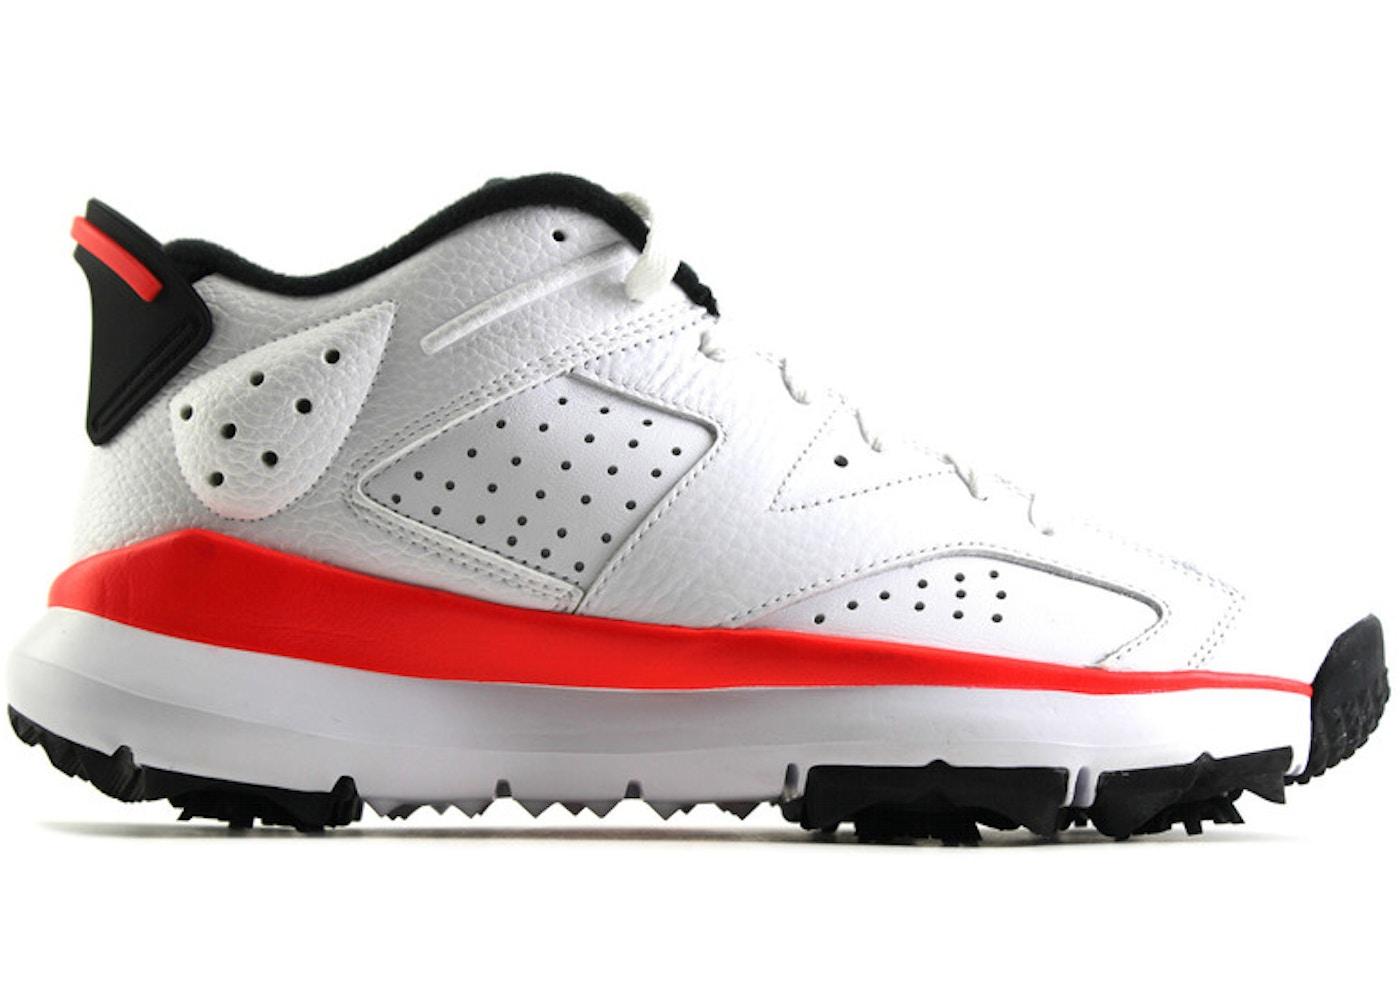 half off 546b5 96f81 Air Jordan 6 Shoes - Average Sale Price